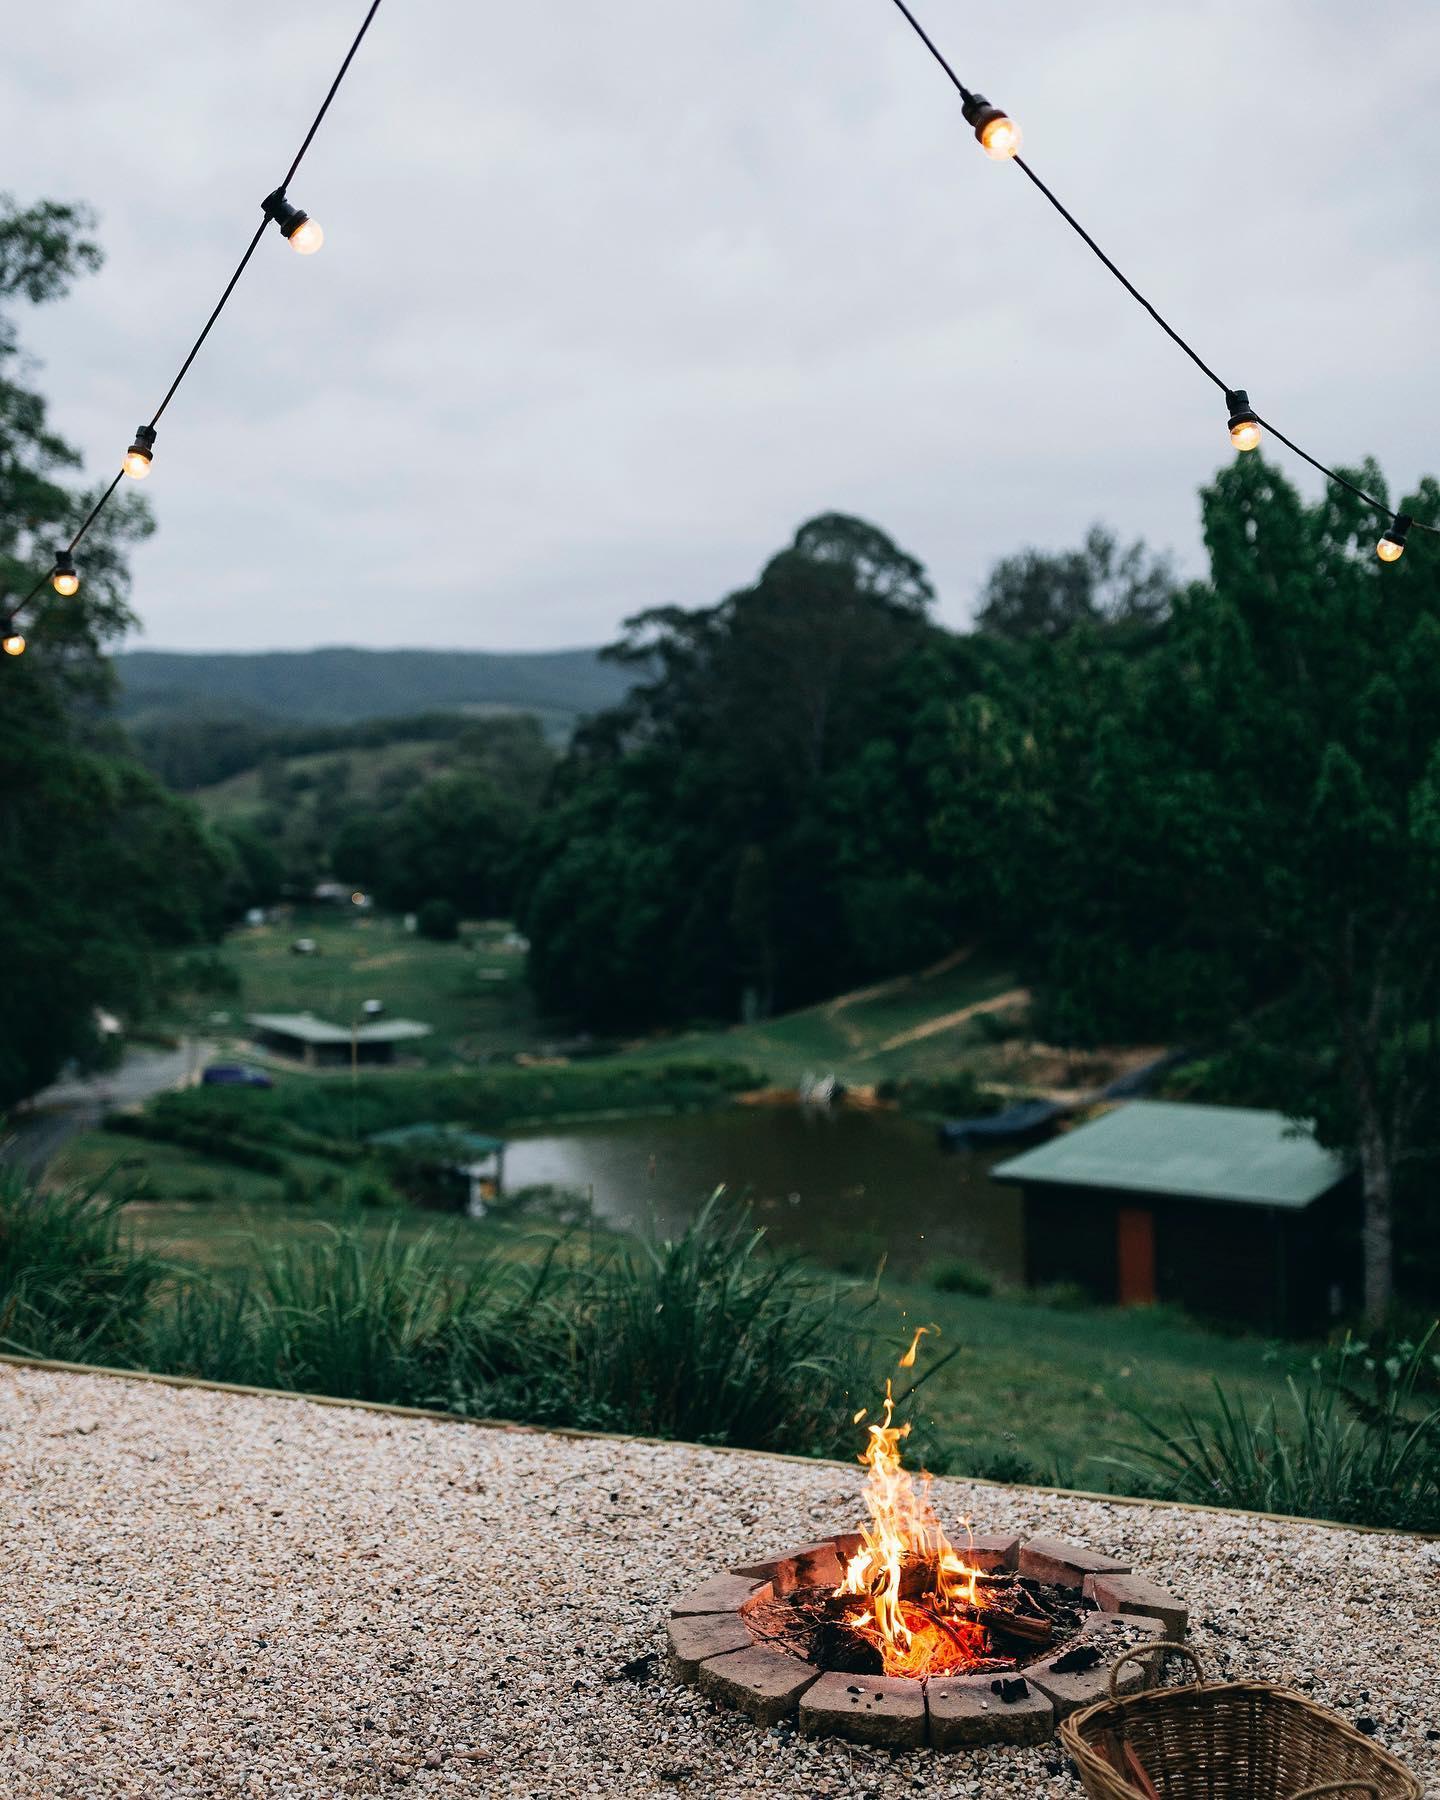 Hosanna farmstay campfire in tweed